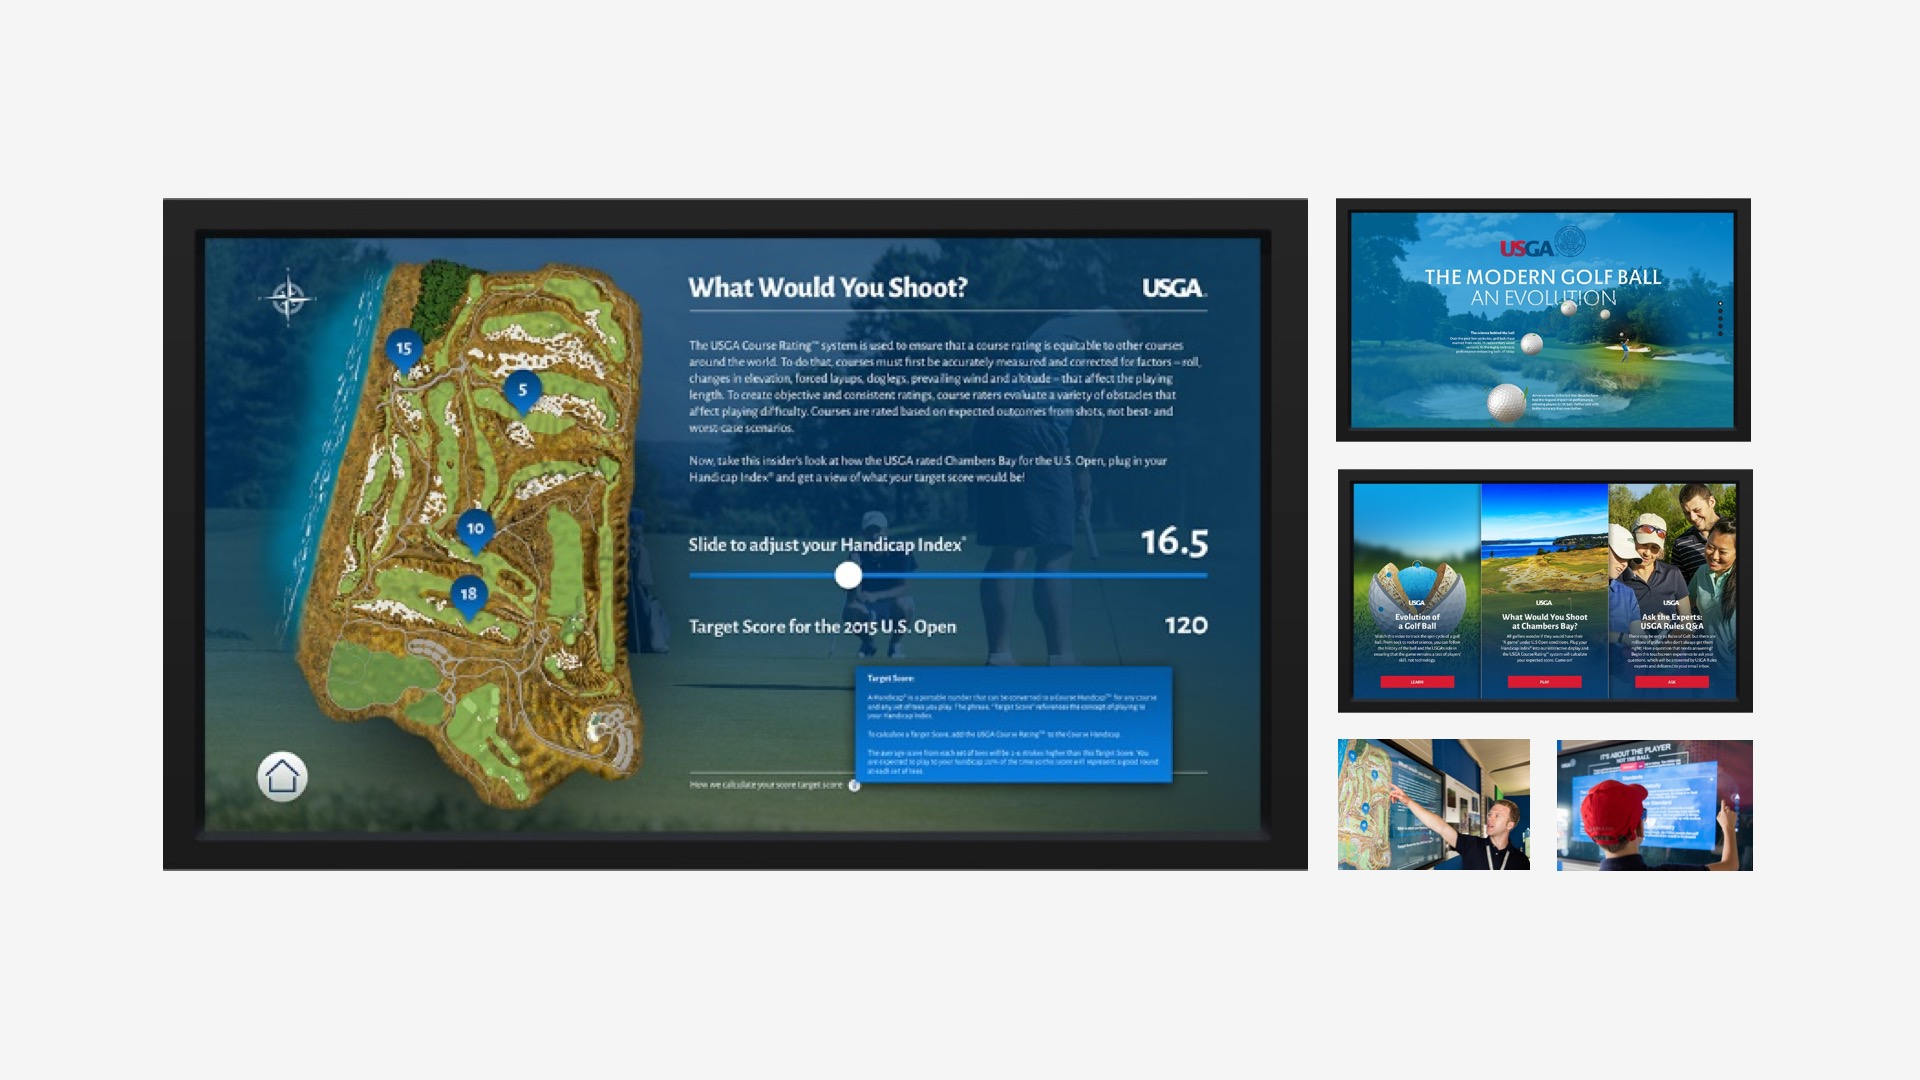 USGA: US Open Touch Screen Programs